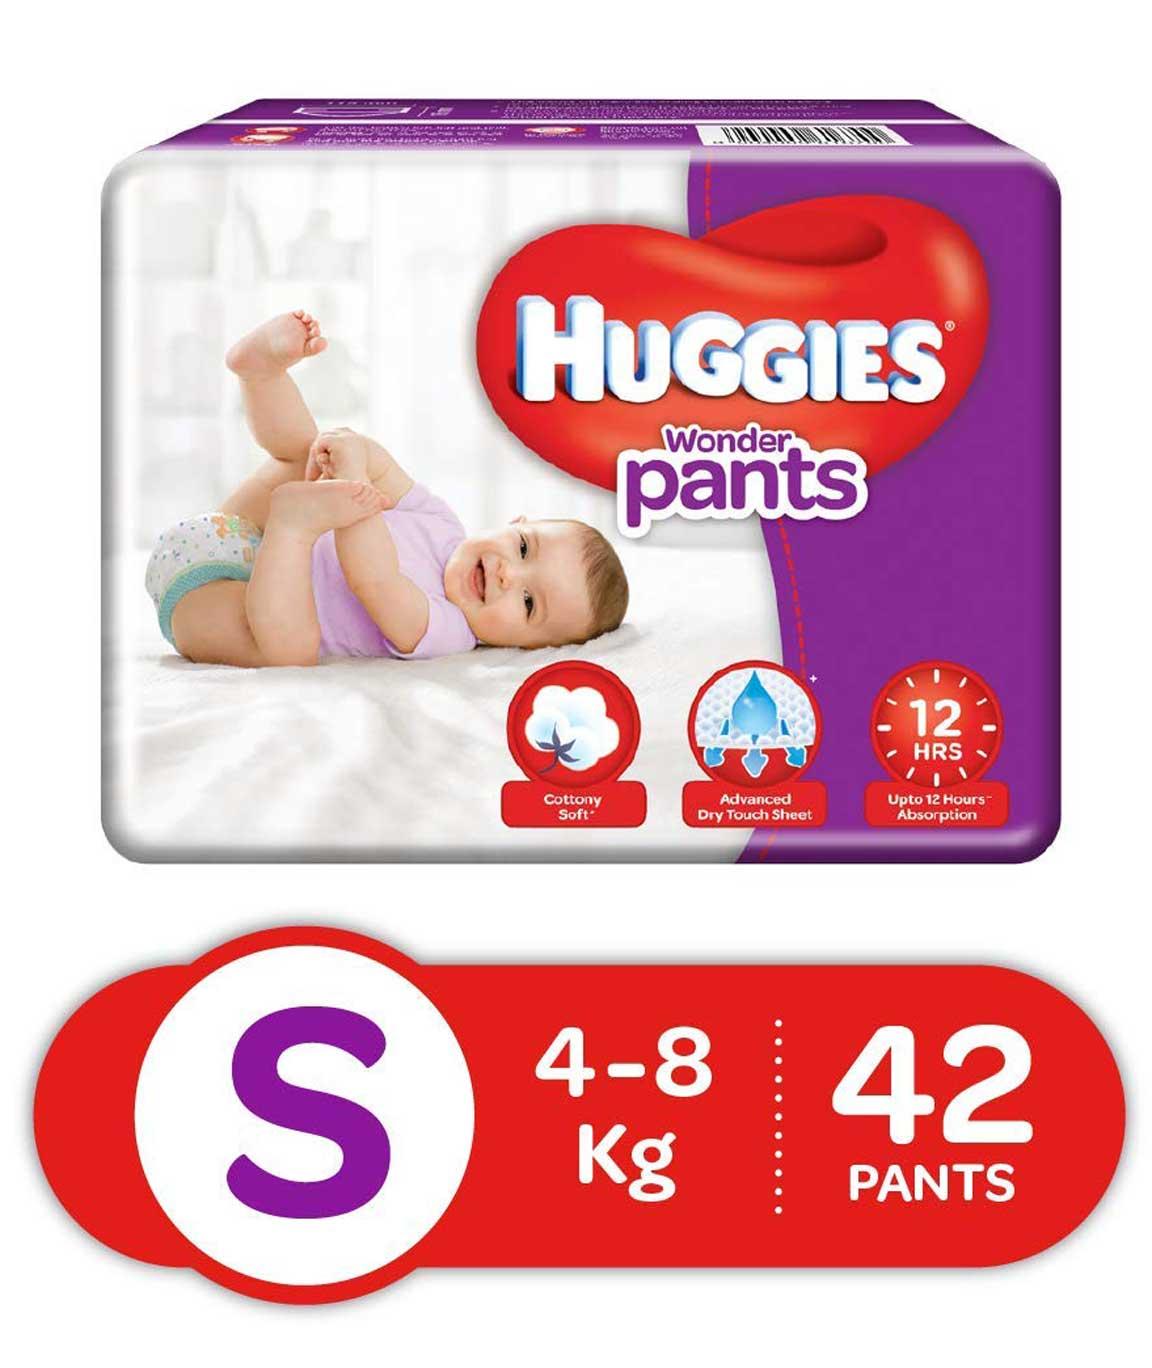 Huggies Wonder Pants Diapers Small Pack of 42